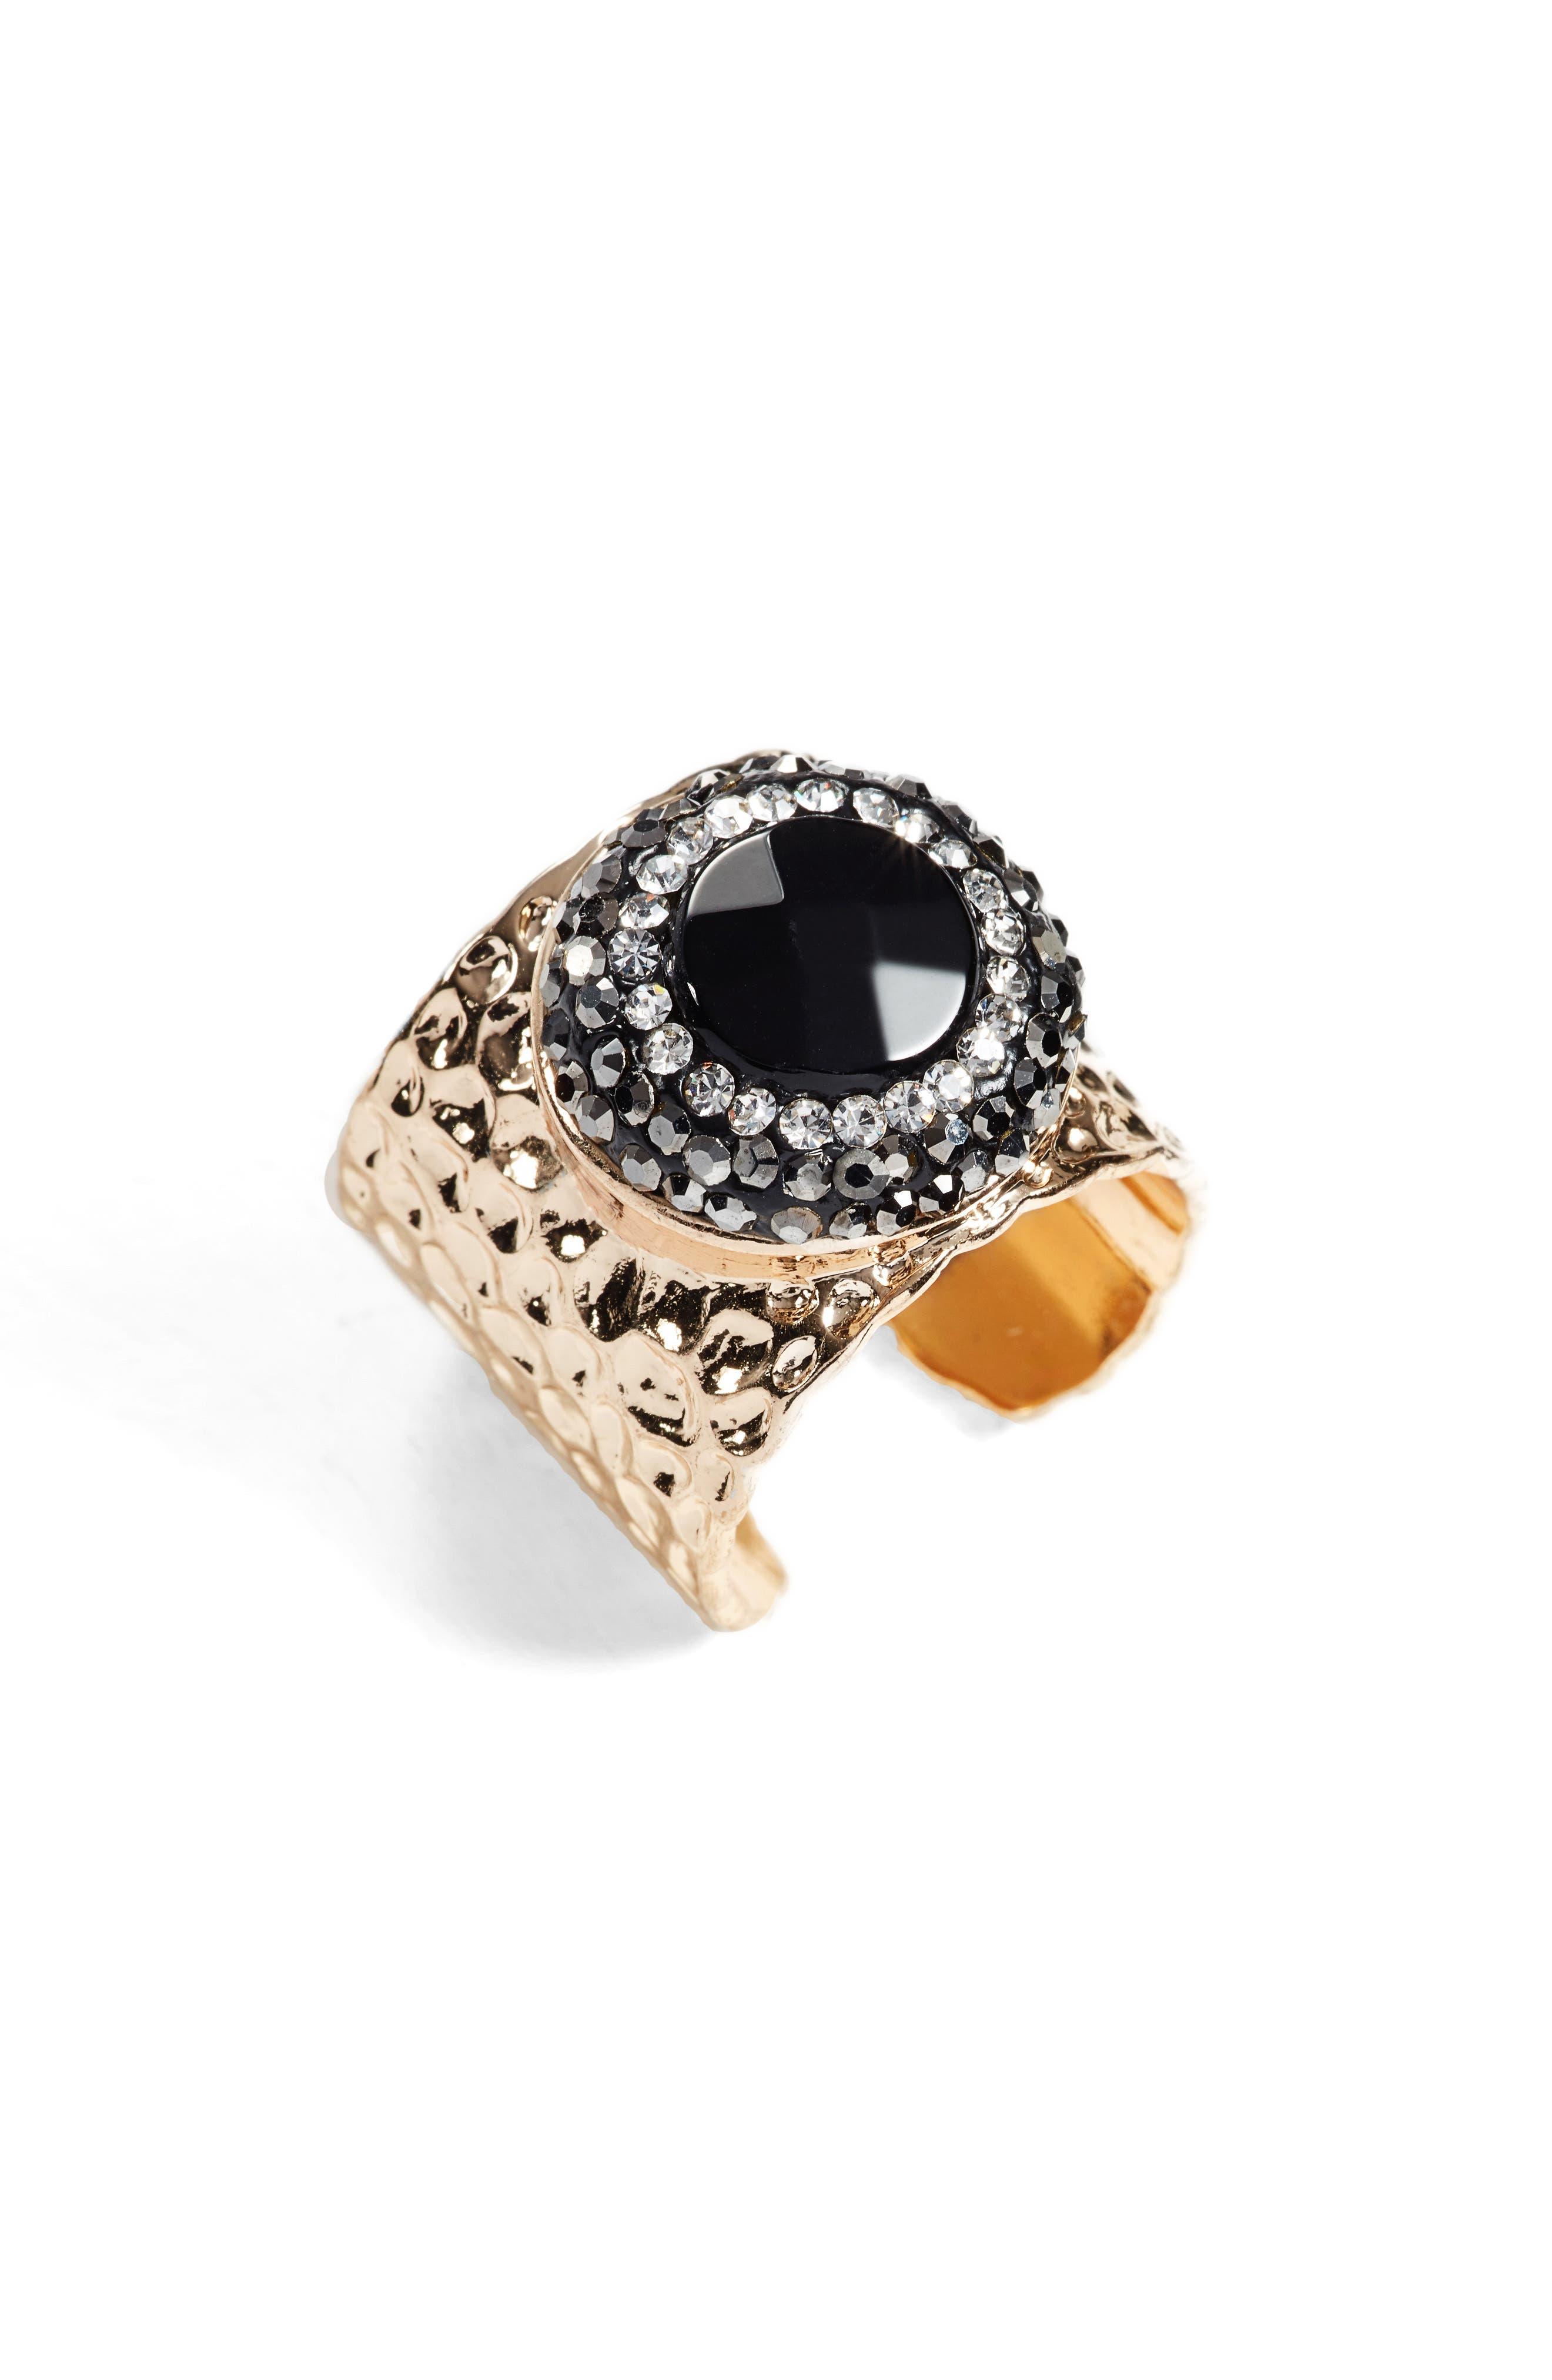 Main Image - Elise M. Reece Agate Adjustable Ring